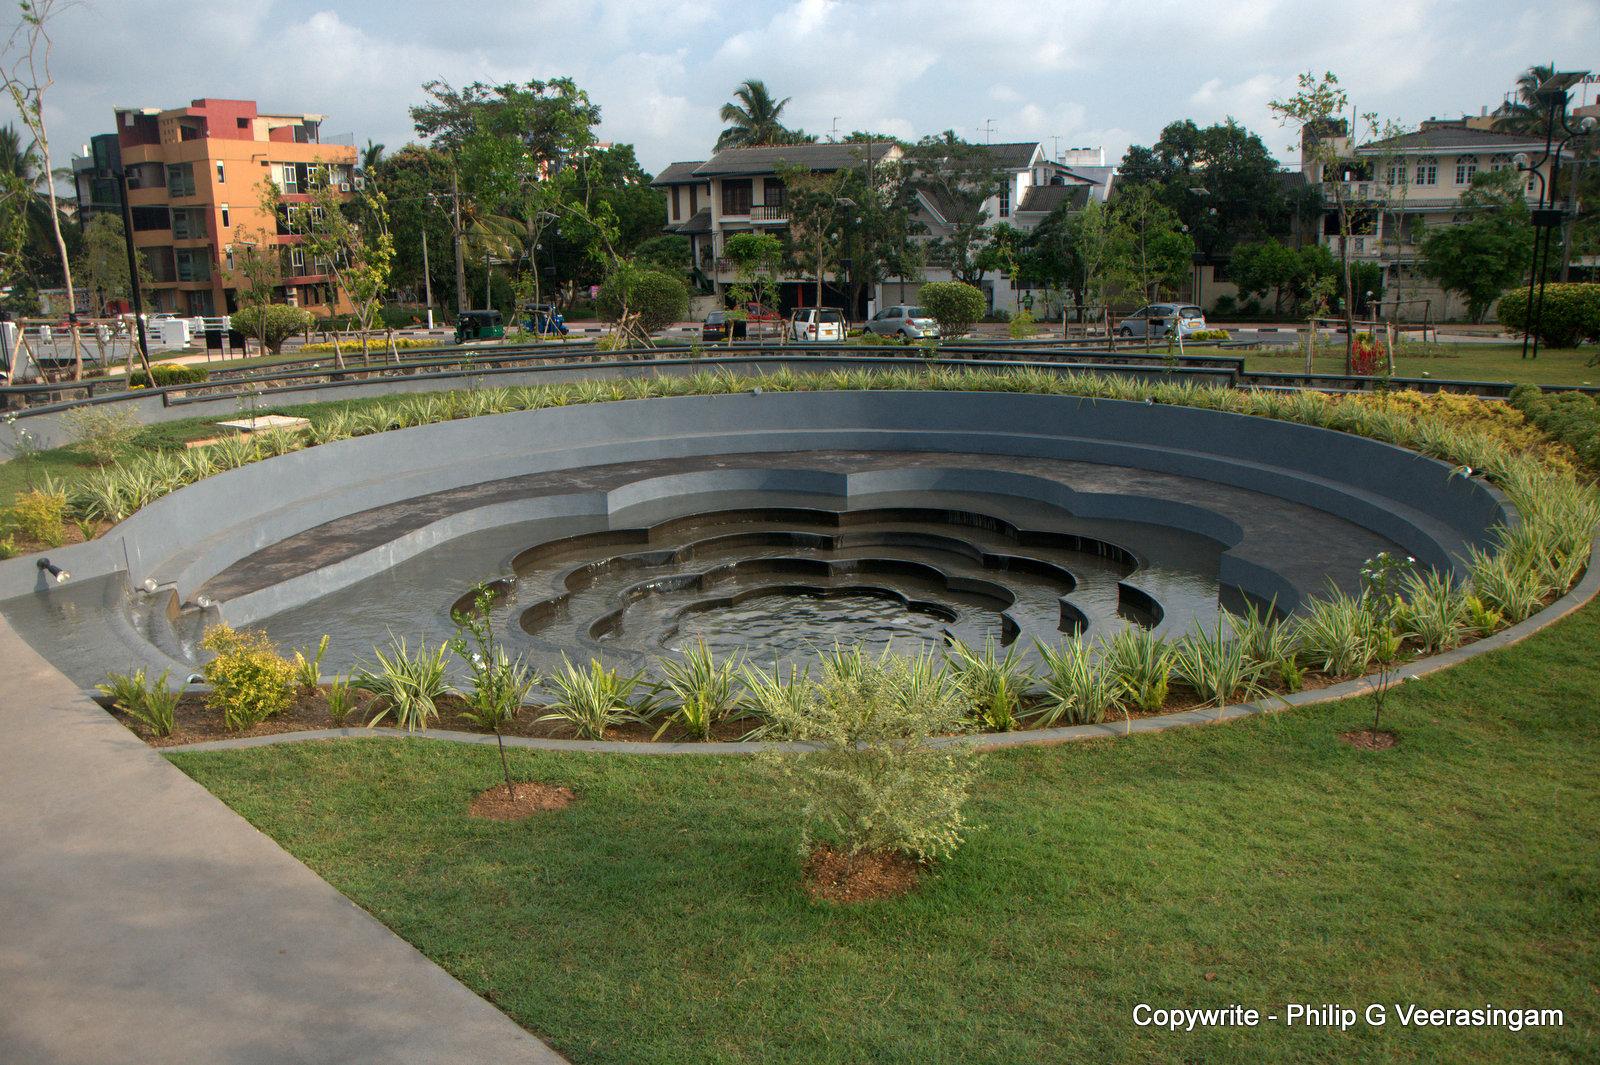 philipveerasingam: Colombo